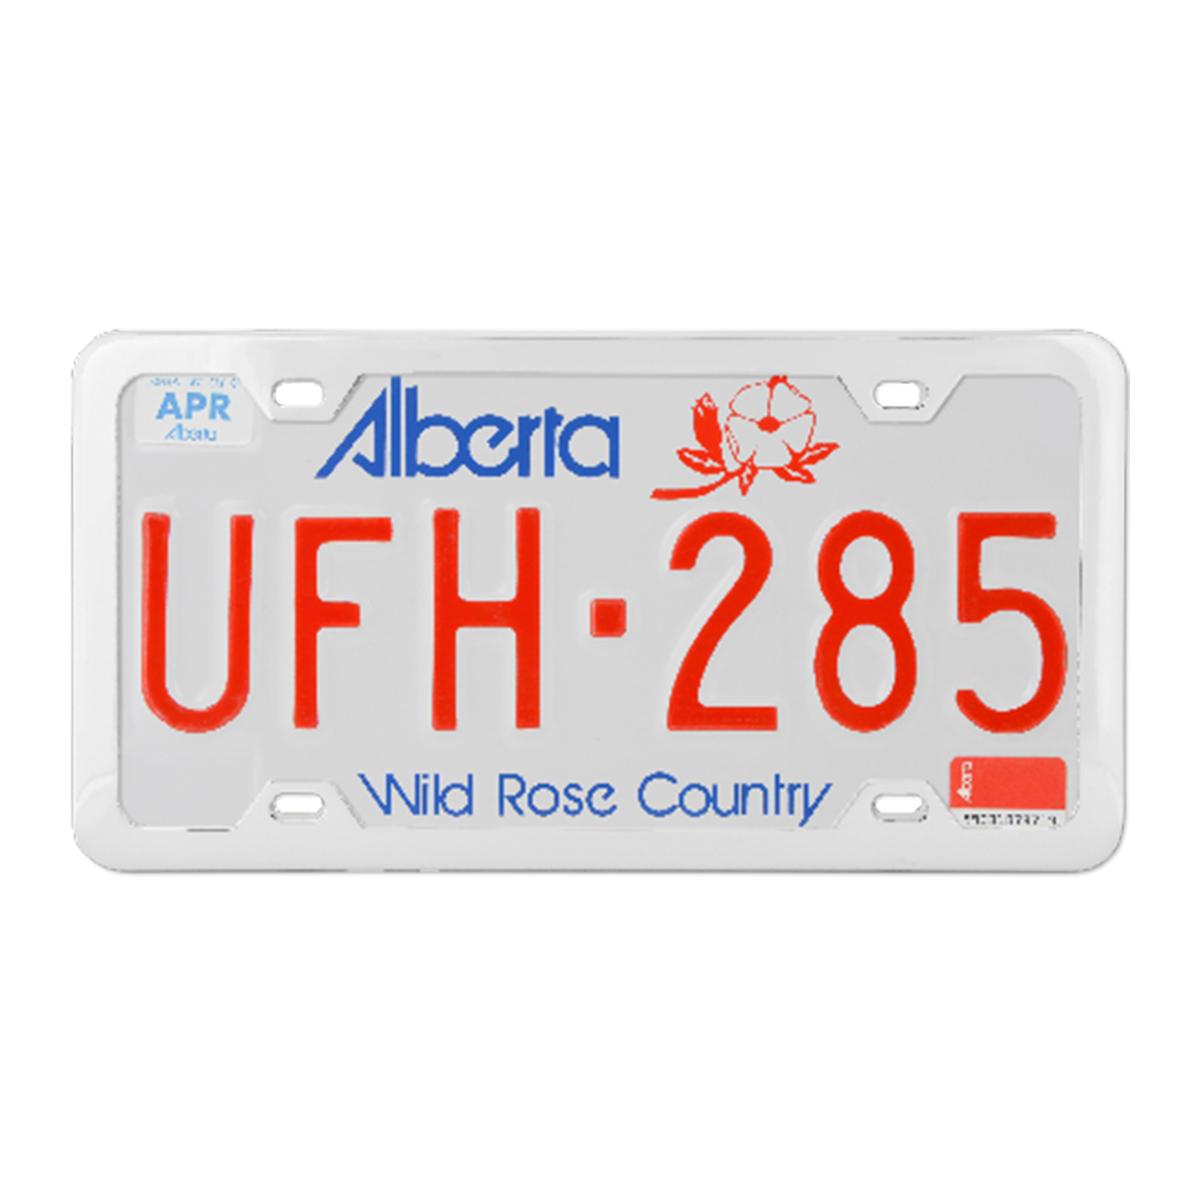 60412 Plain Chrome Plated 4 Hole License Plate Frame - Profile View